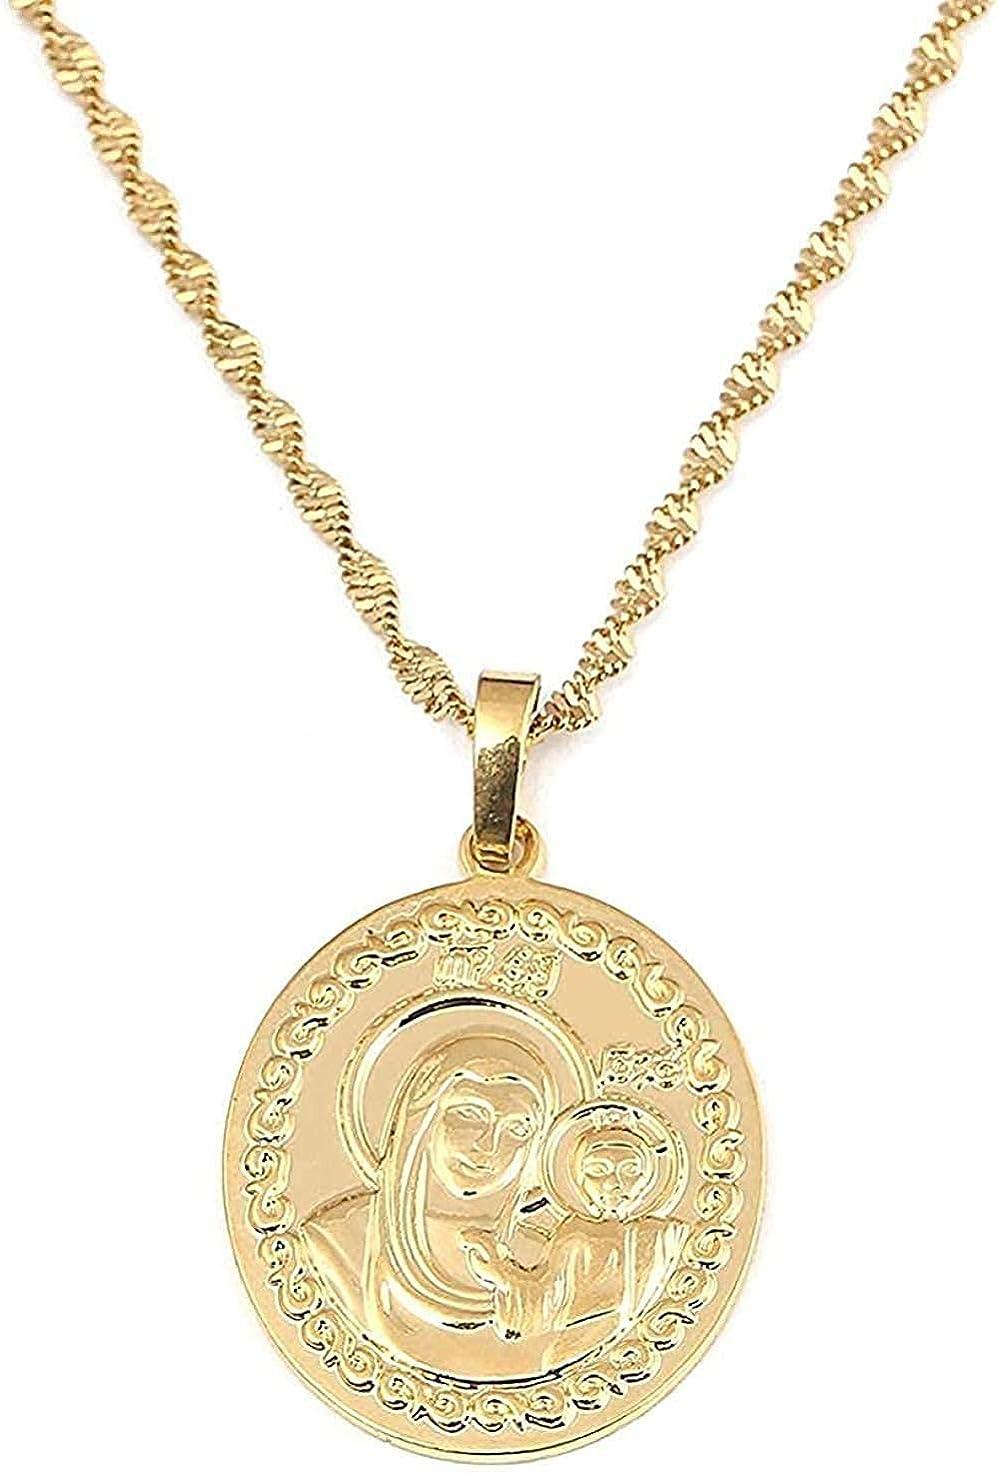 Yiffshunl Collar Ruso Collar con Colgante de Color Dorado Rusia Grecia Ucrania Cadena joyería Colgante Collar niñas niños Regalo